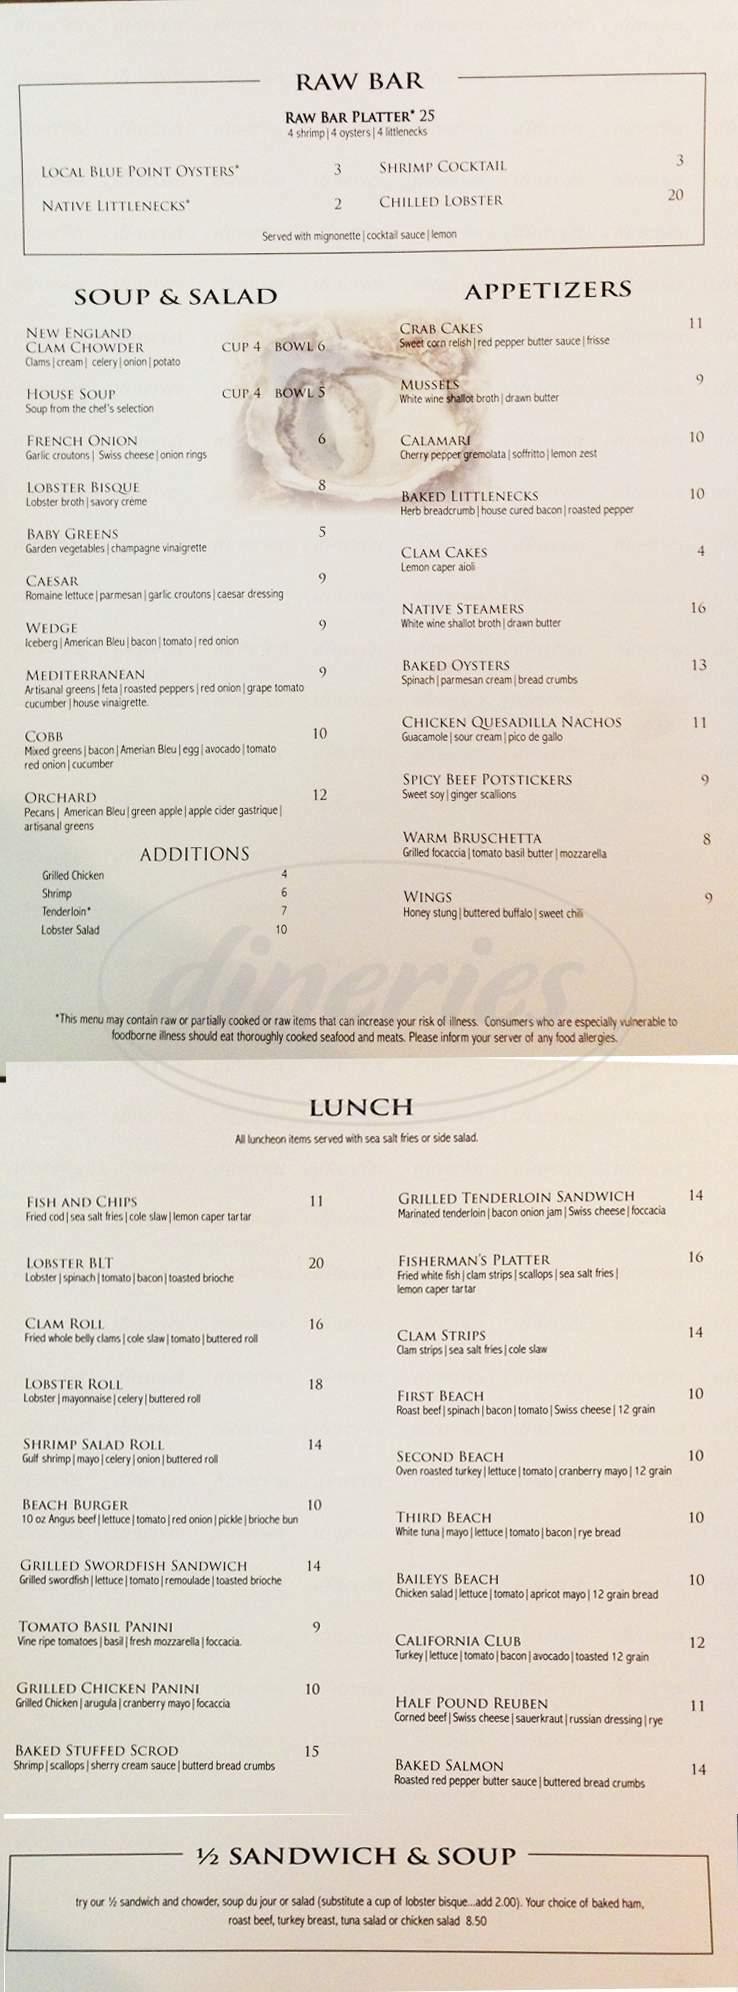 menu for Atlantic Beach Club